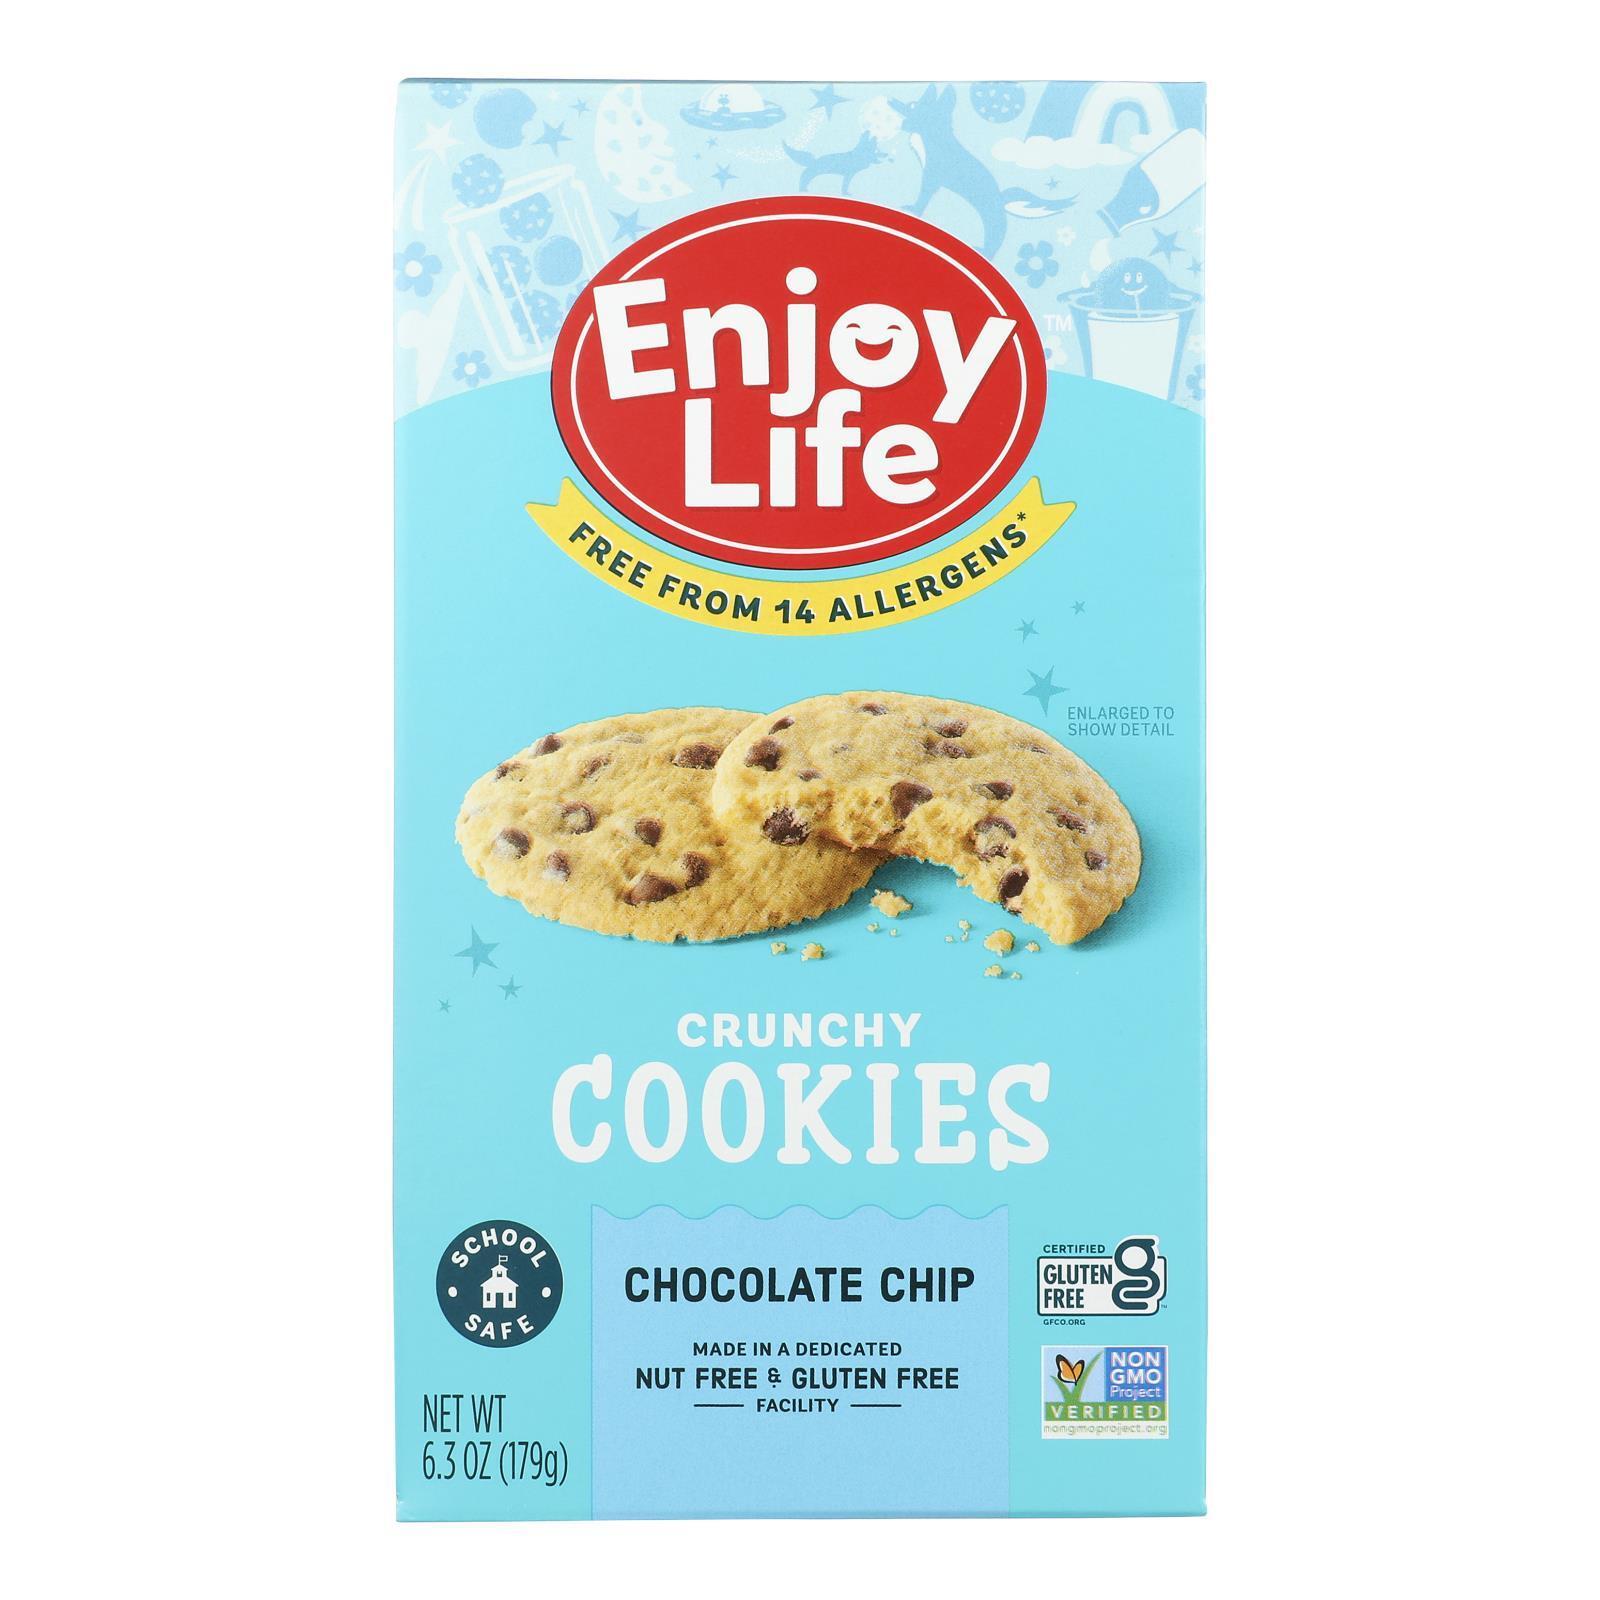 Enjoy Life Cookie - Crunchy - Chocolate Chip - Gluten Free - 6.3 oz - case of 6